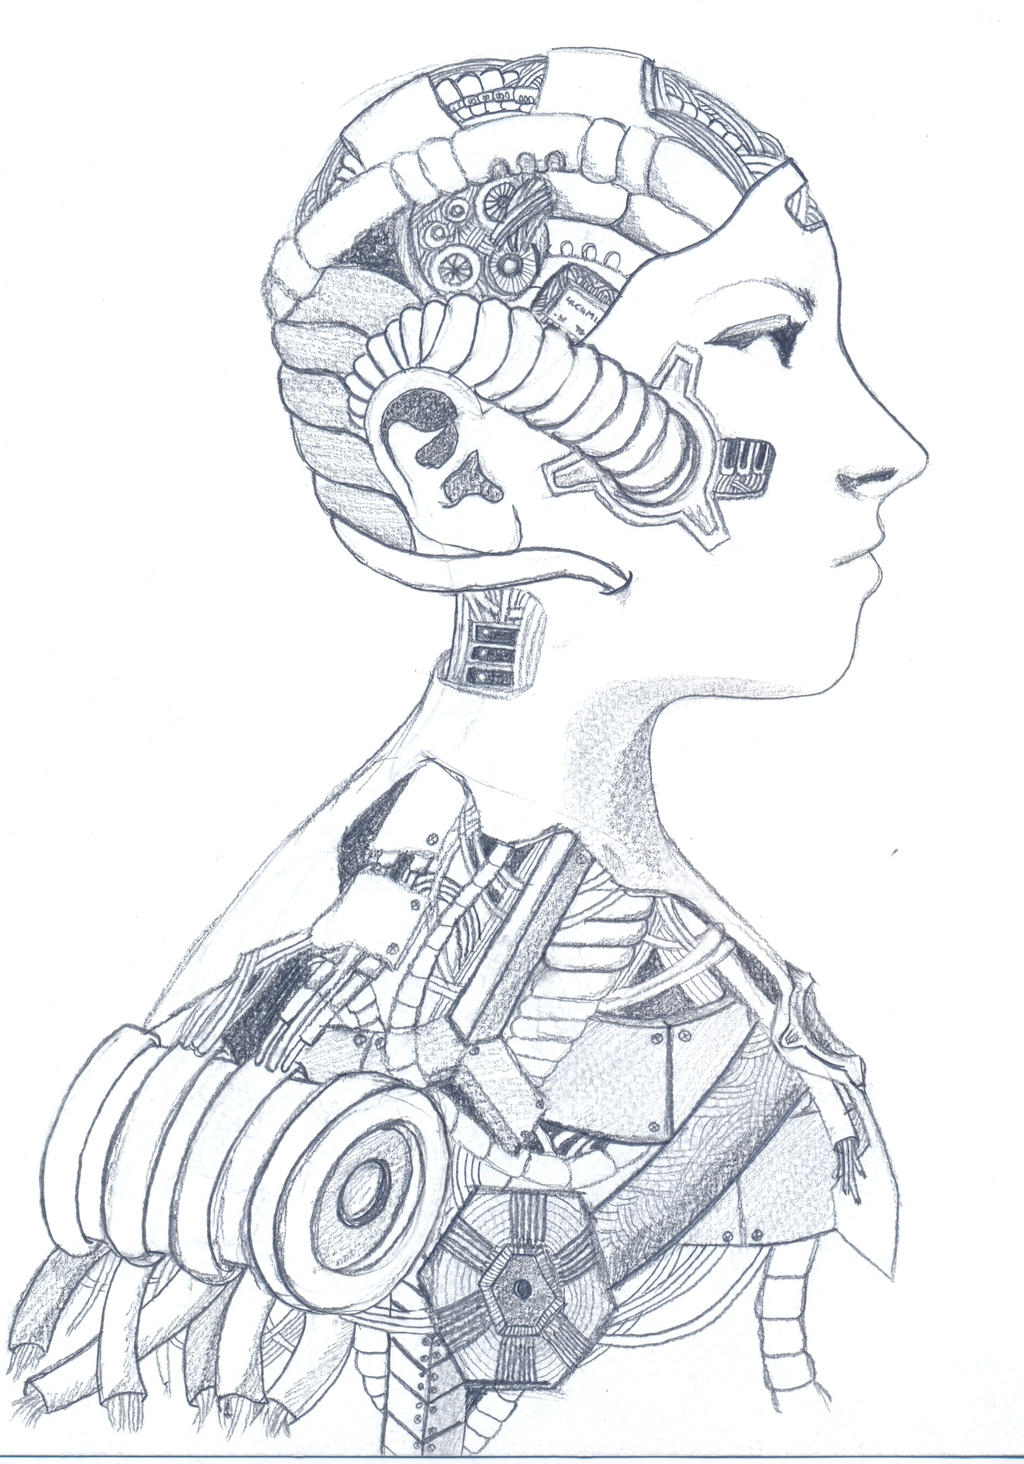 Cyborg sketchdoodle 1 ...